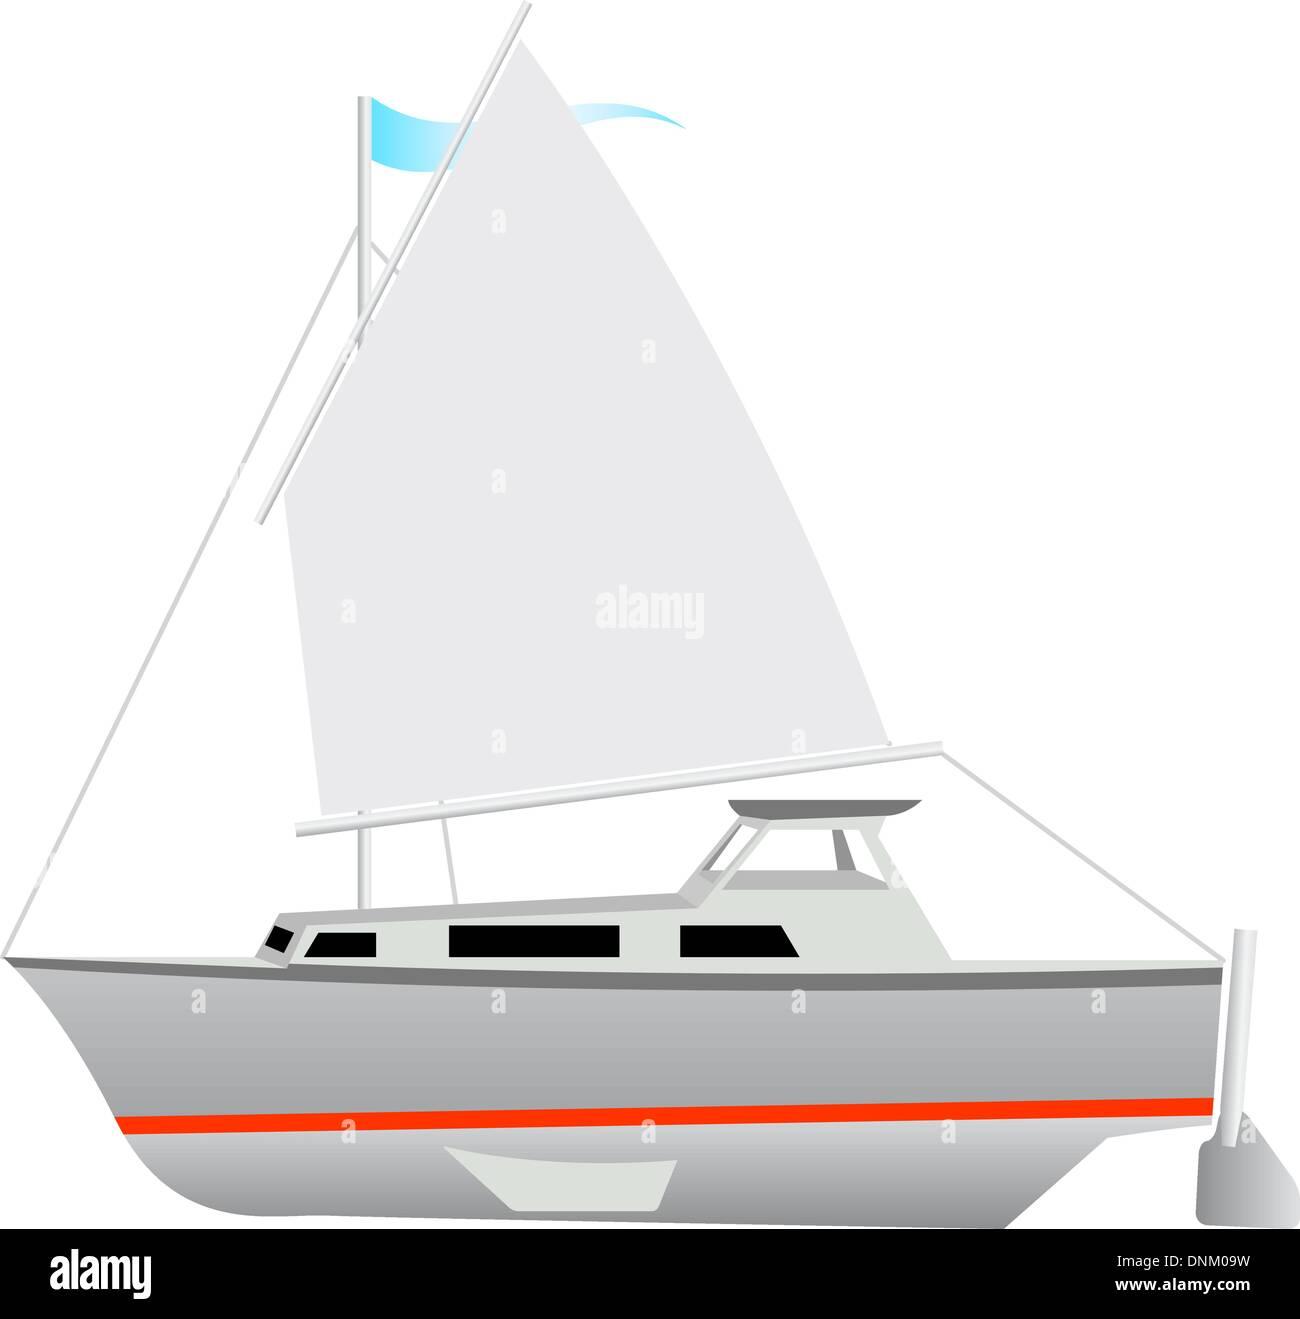 Sailing boat floating. Vector illustration. - Stock Image